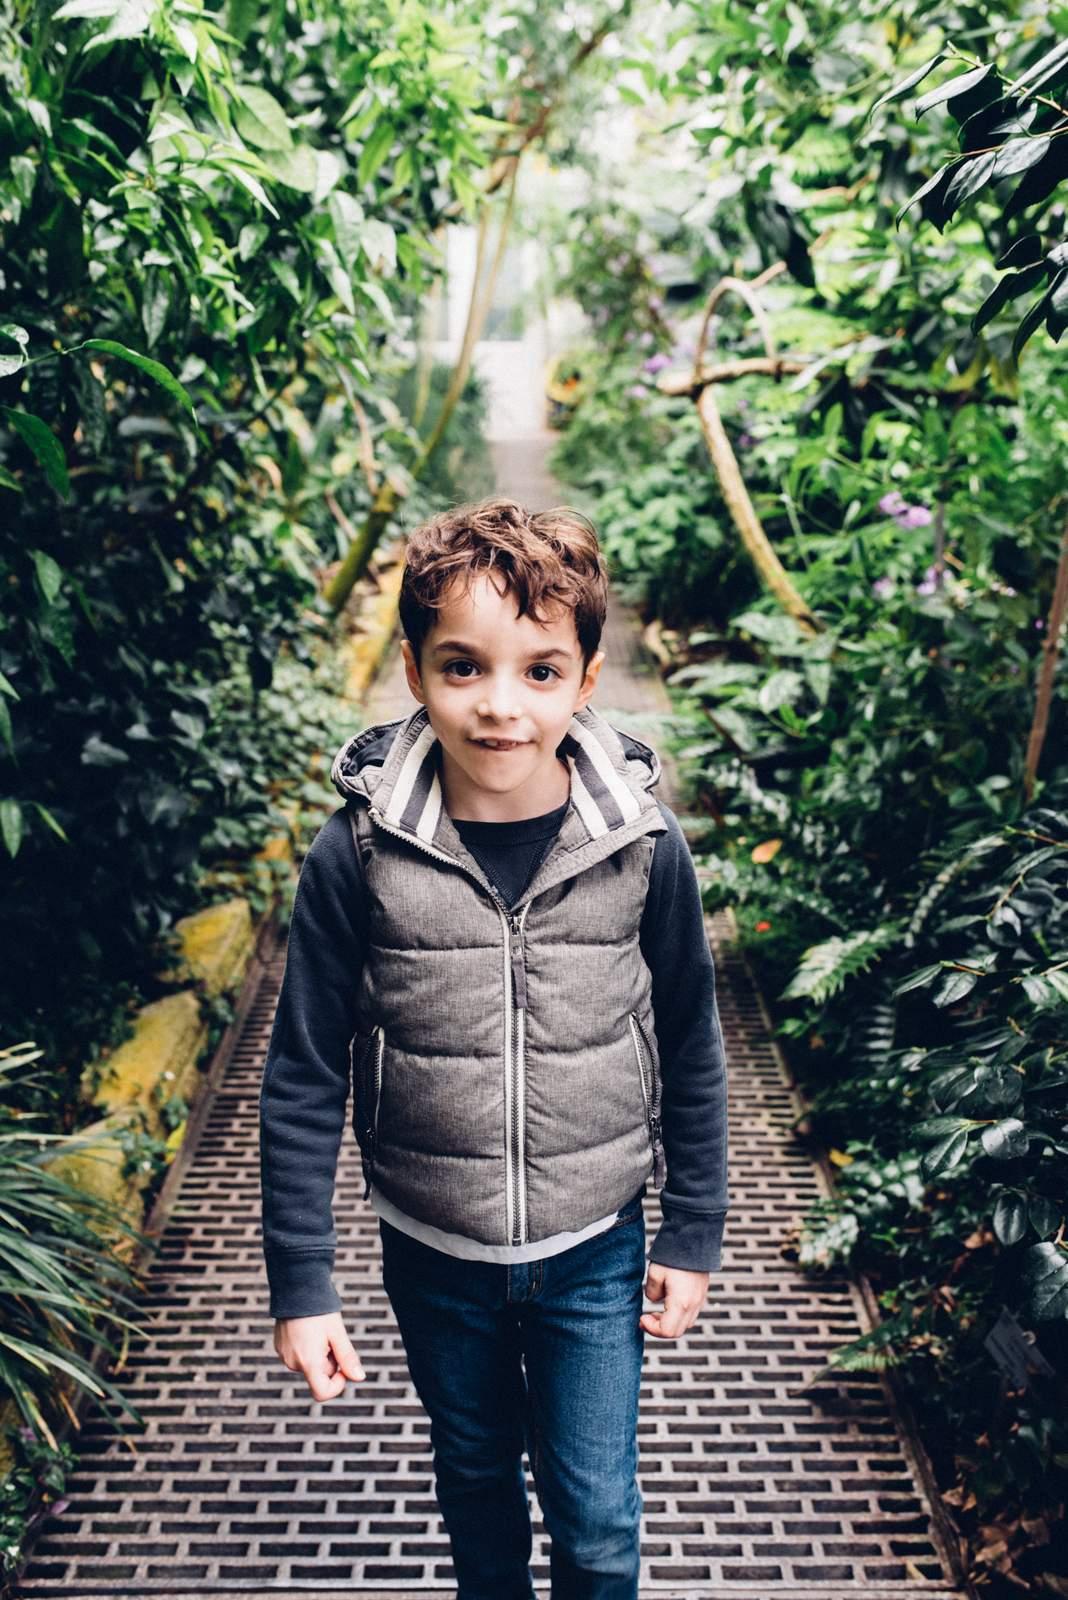 copenhagen-botanical-gardens-house-of-valentina-31